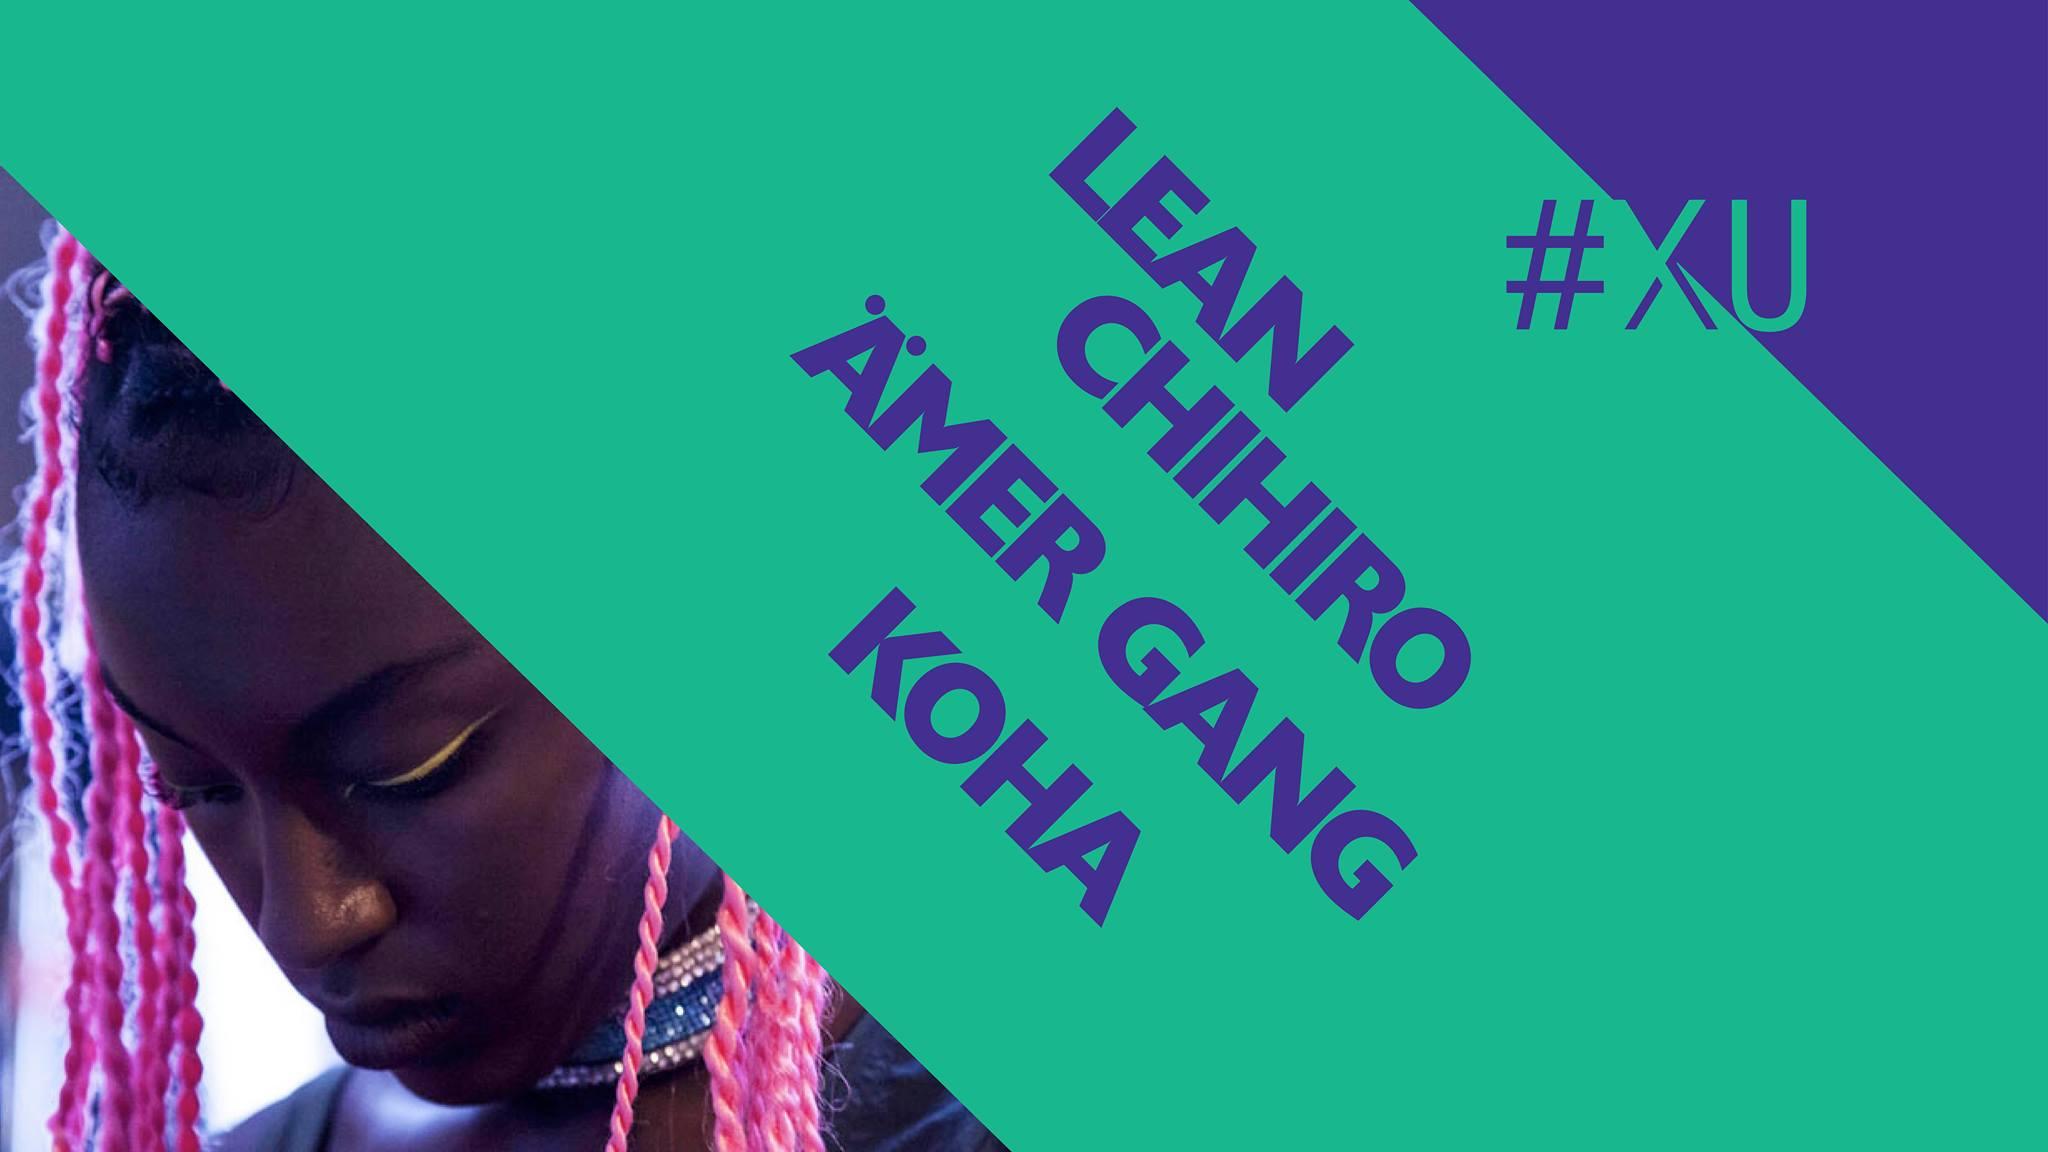 Lean Chihiro + Ämer Gang + Kōha